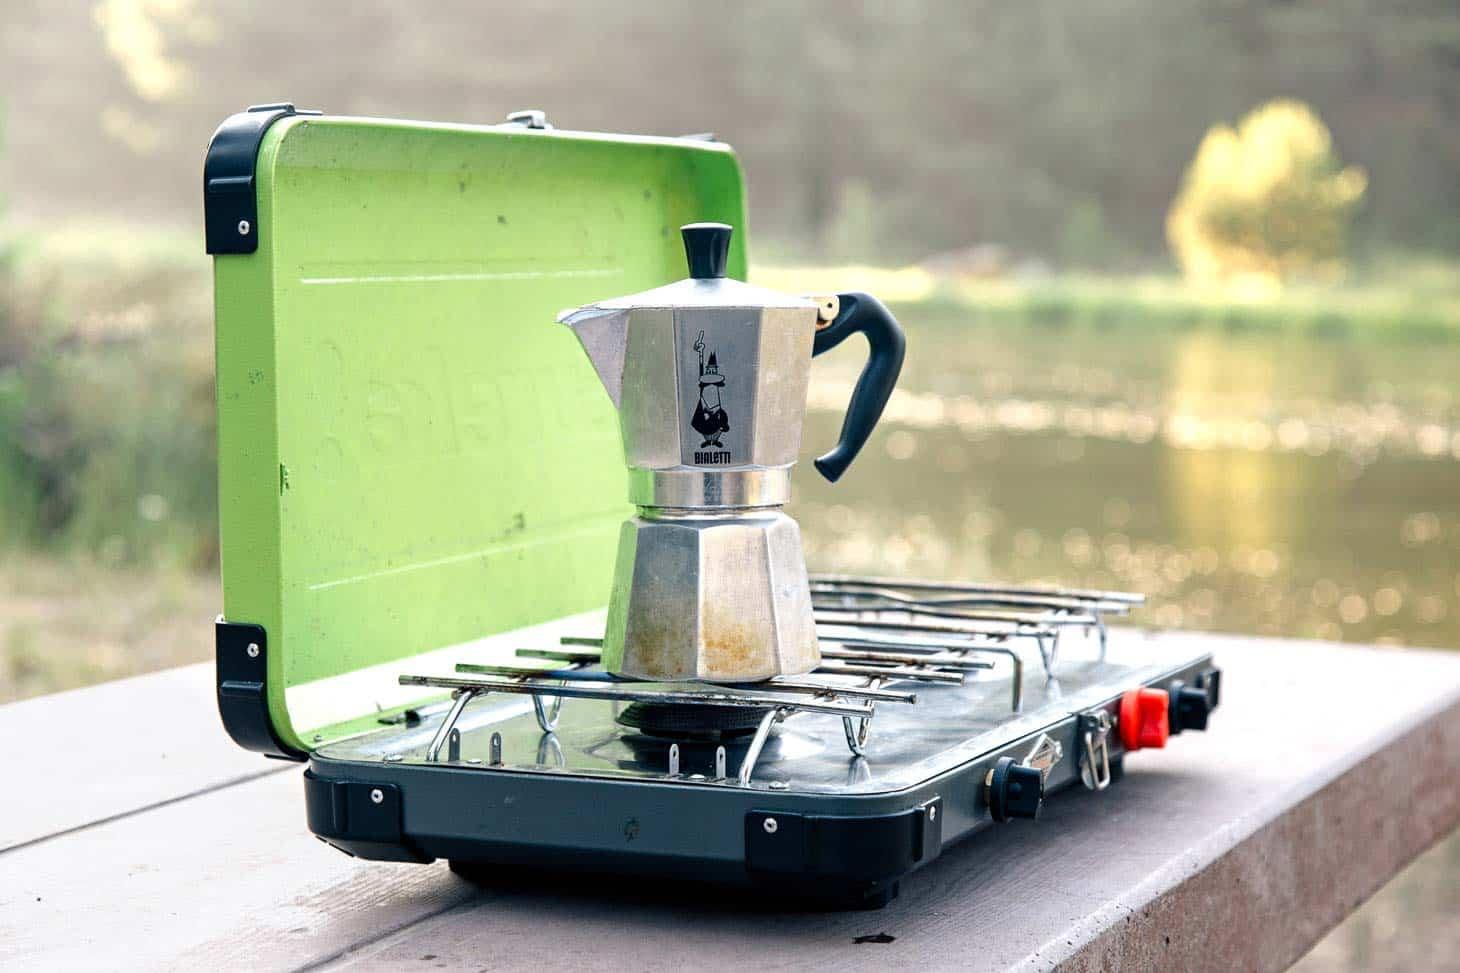 Moka Pot on a grenn camping stove